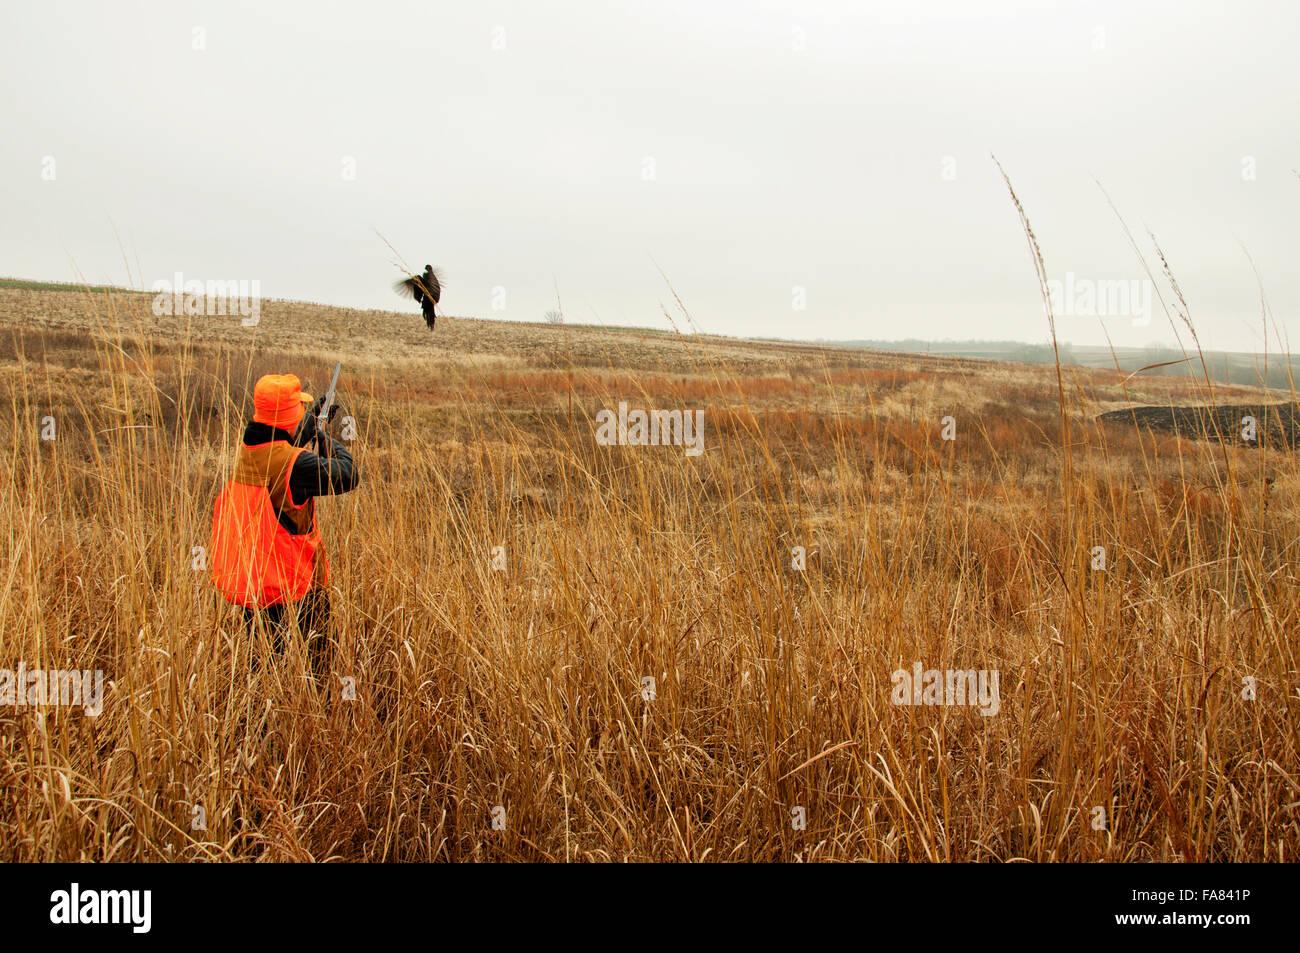 Jäger schießen Fasan im Feld Stockbild